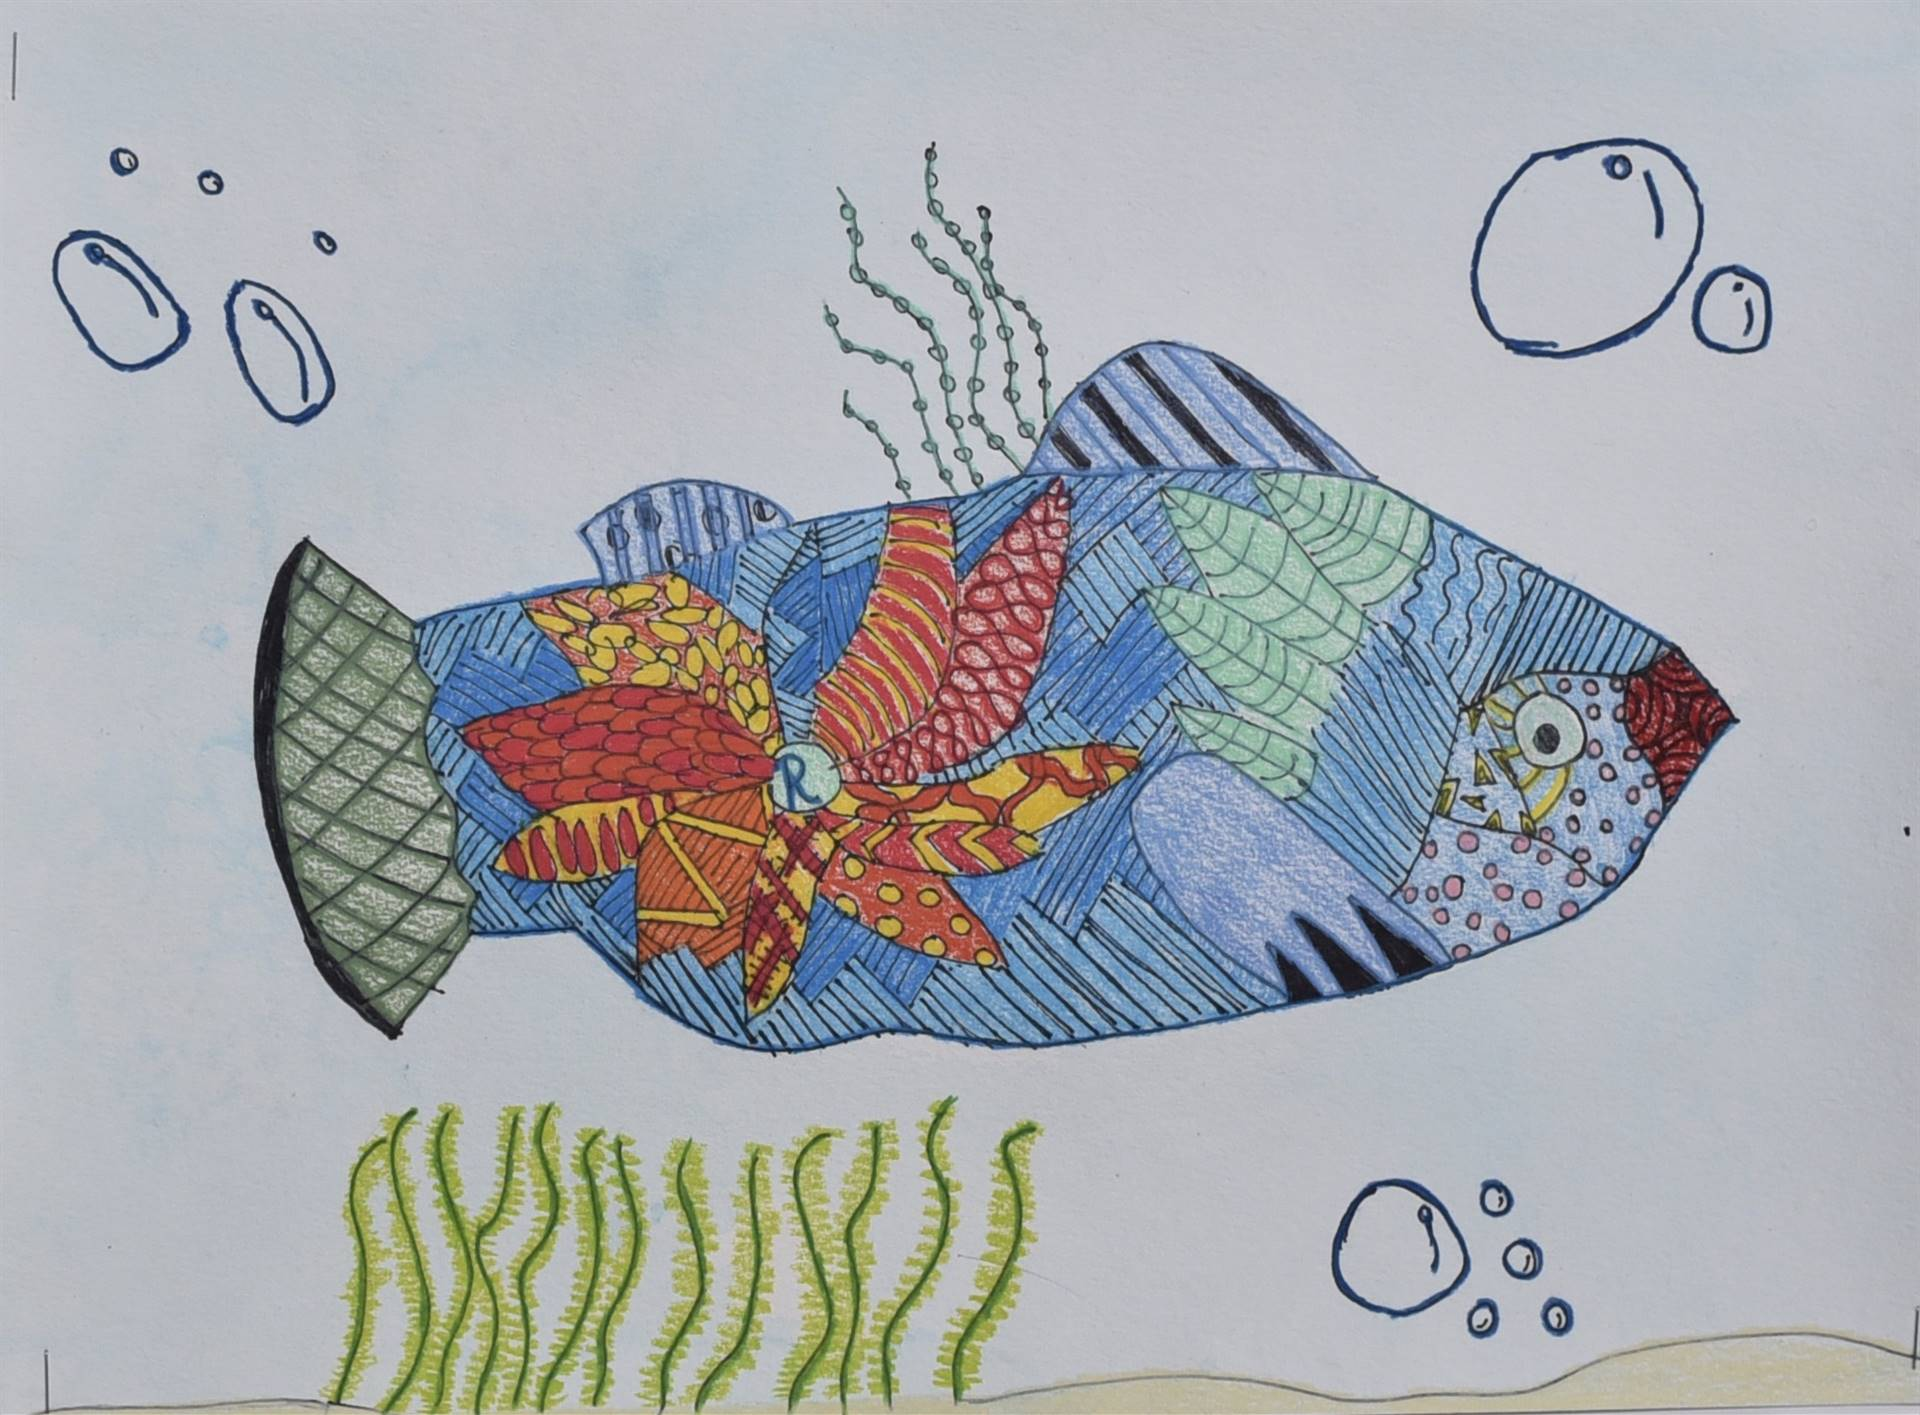 Brecksville-Broadview Hts. Middle School Art Projects 144